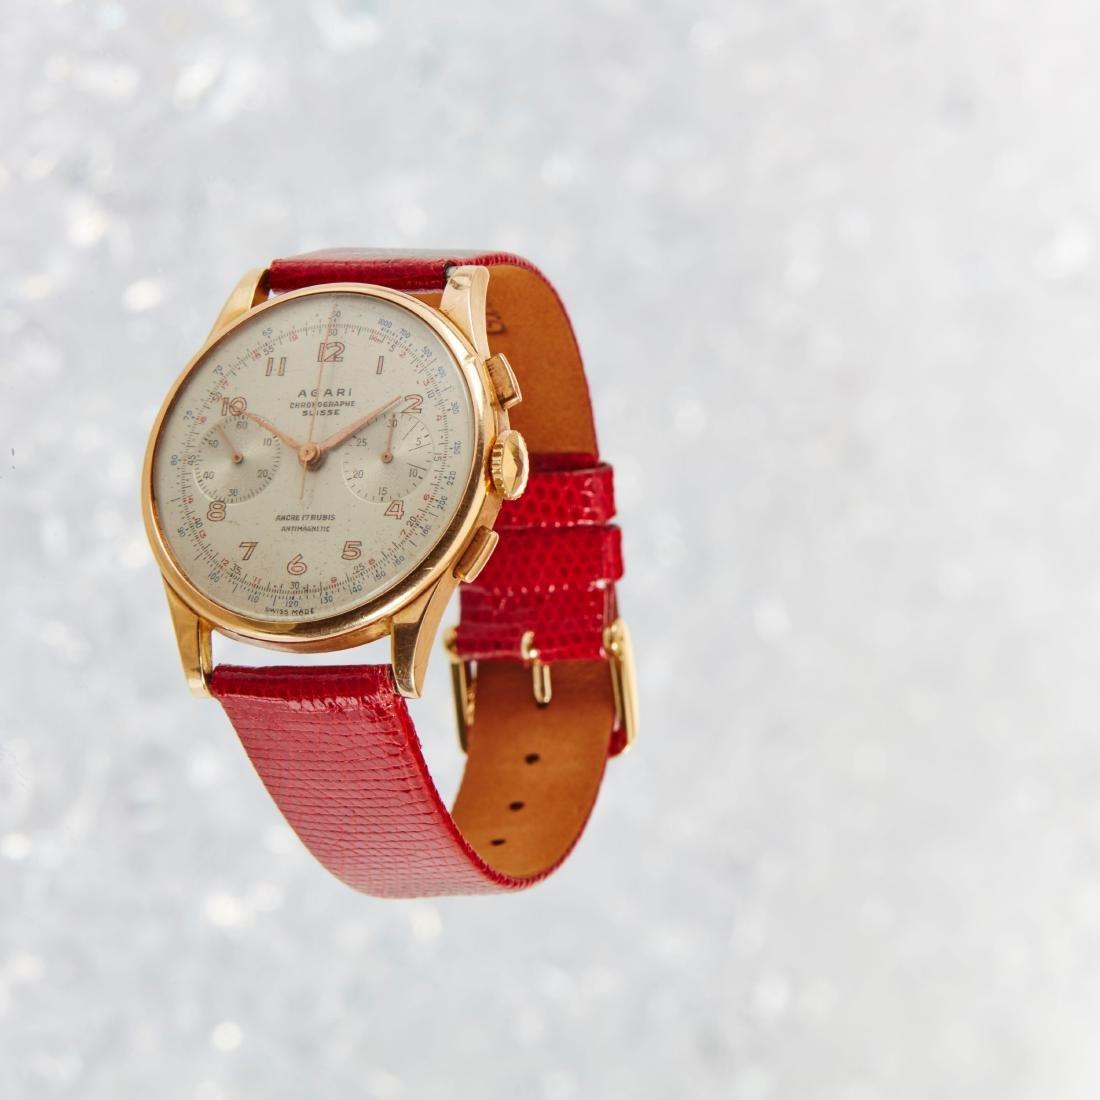 Agari, Chronographe Suisse Wristwatch - 2